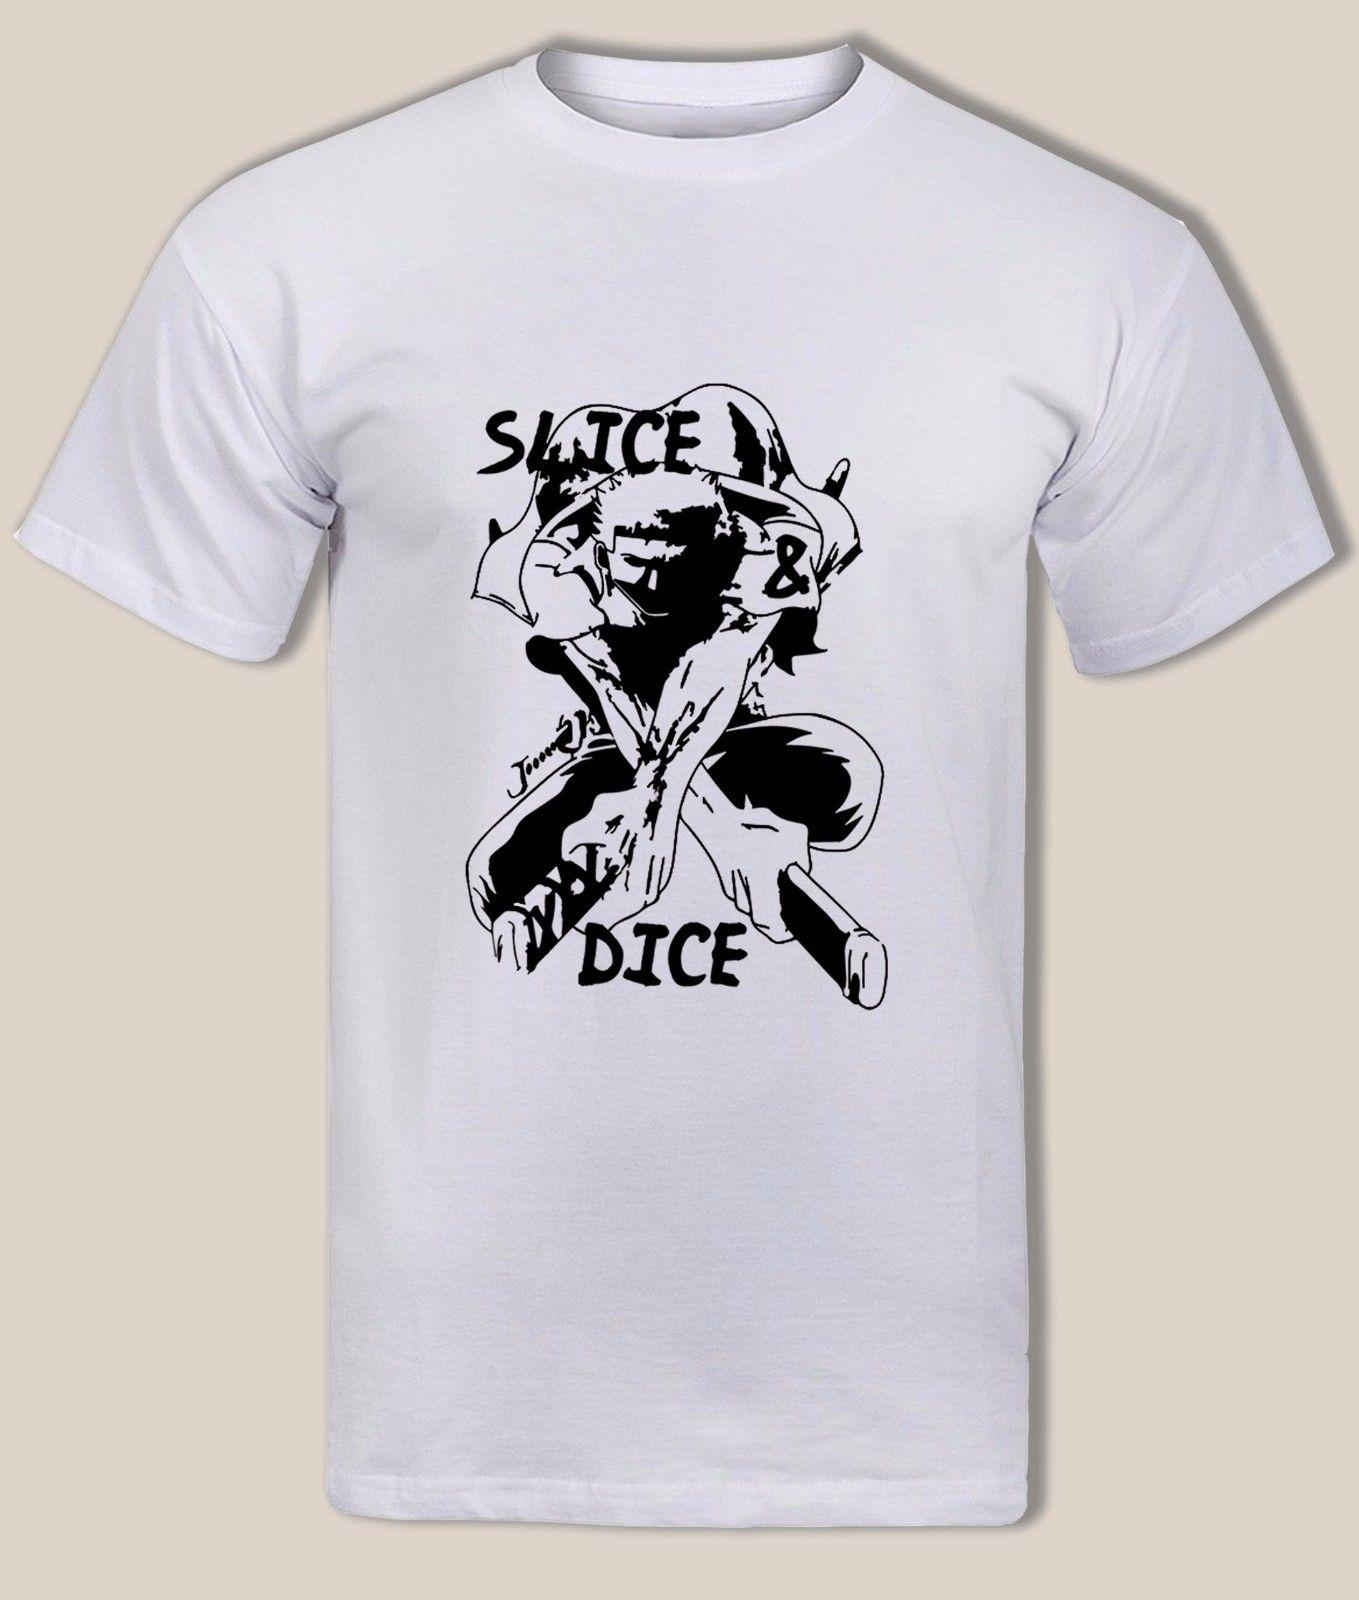 e9adc3779c0 Zoro T Shirt Swordsman Straw Hat Pirate T One Piece Shirt Anime Shirt Mens  Tops Cool O Neck T Shirt Design Tops Urban T Shirts Irish T Shirts From ...